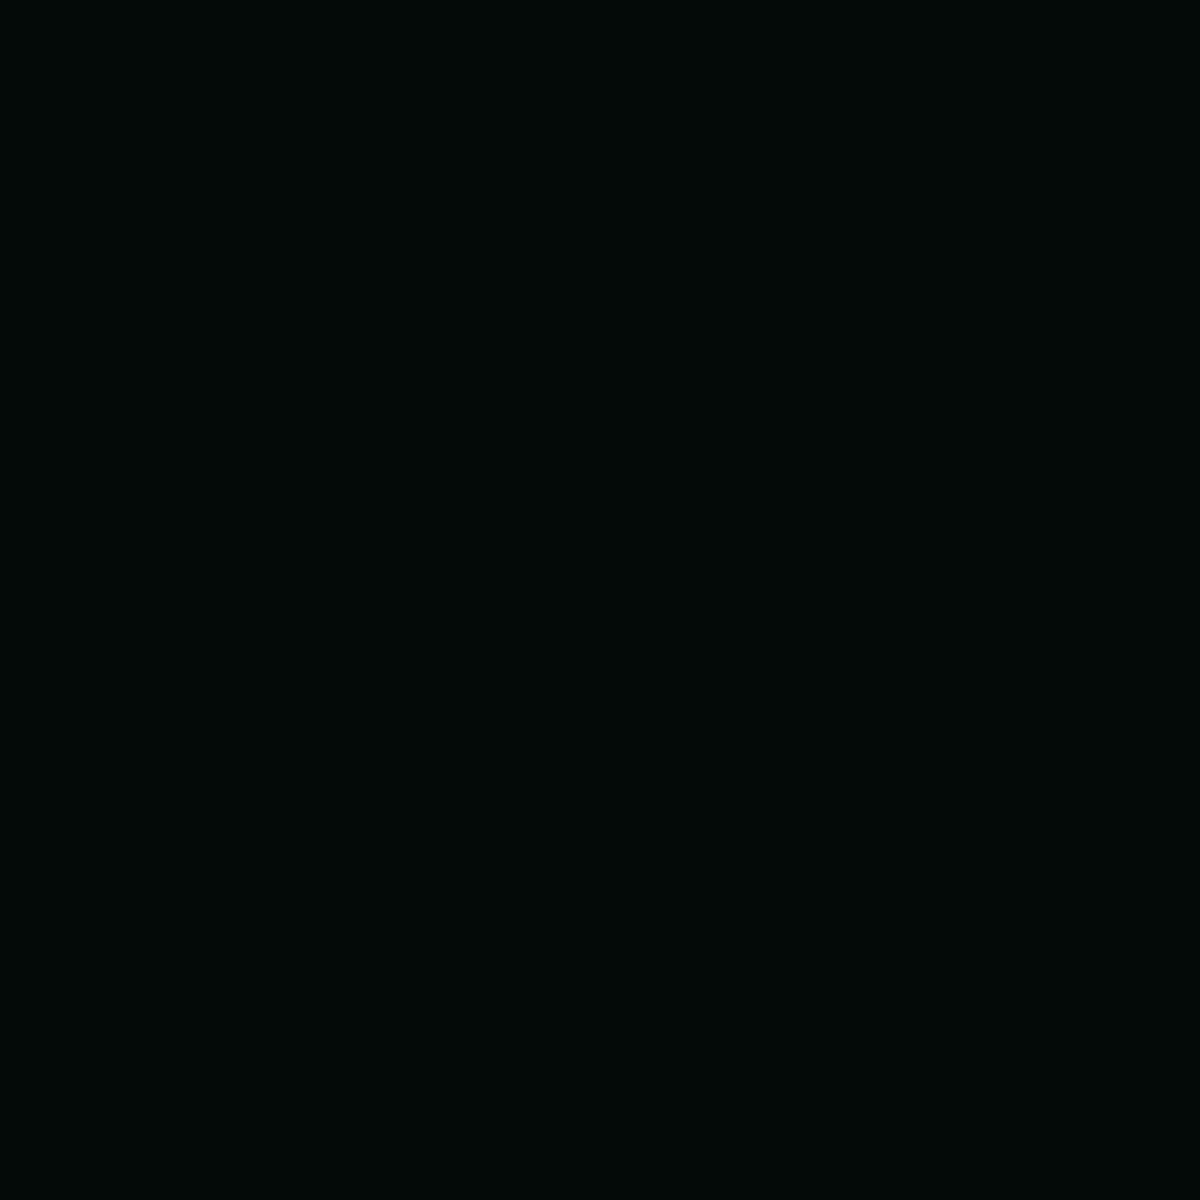 Panneau Melamine Noir Mat ppsm eurodekor noir u999 st2 qualité standard pel 280x207cm 19mm